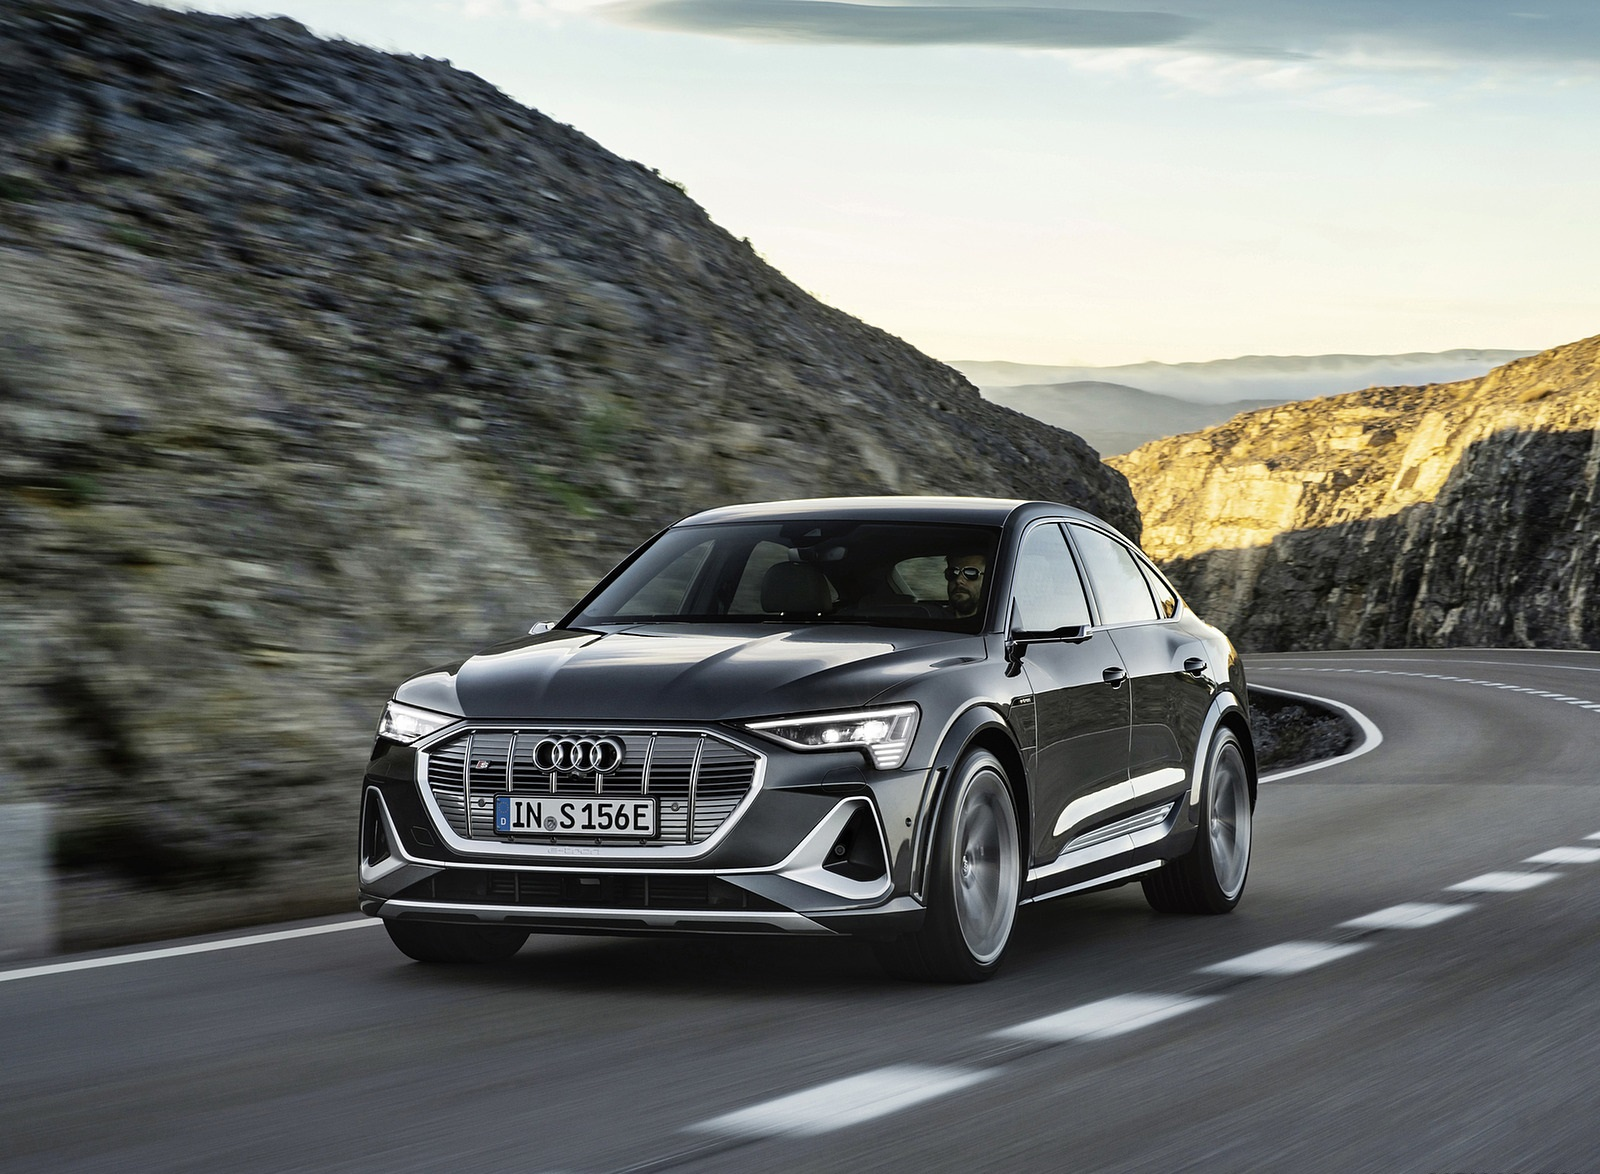 2021 Audi e-tron S Sportback (Color: Daytona Gray) Front Wallpapers (1)